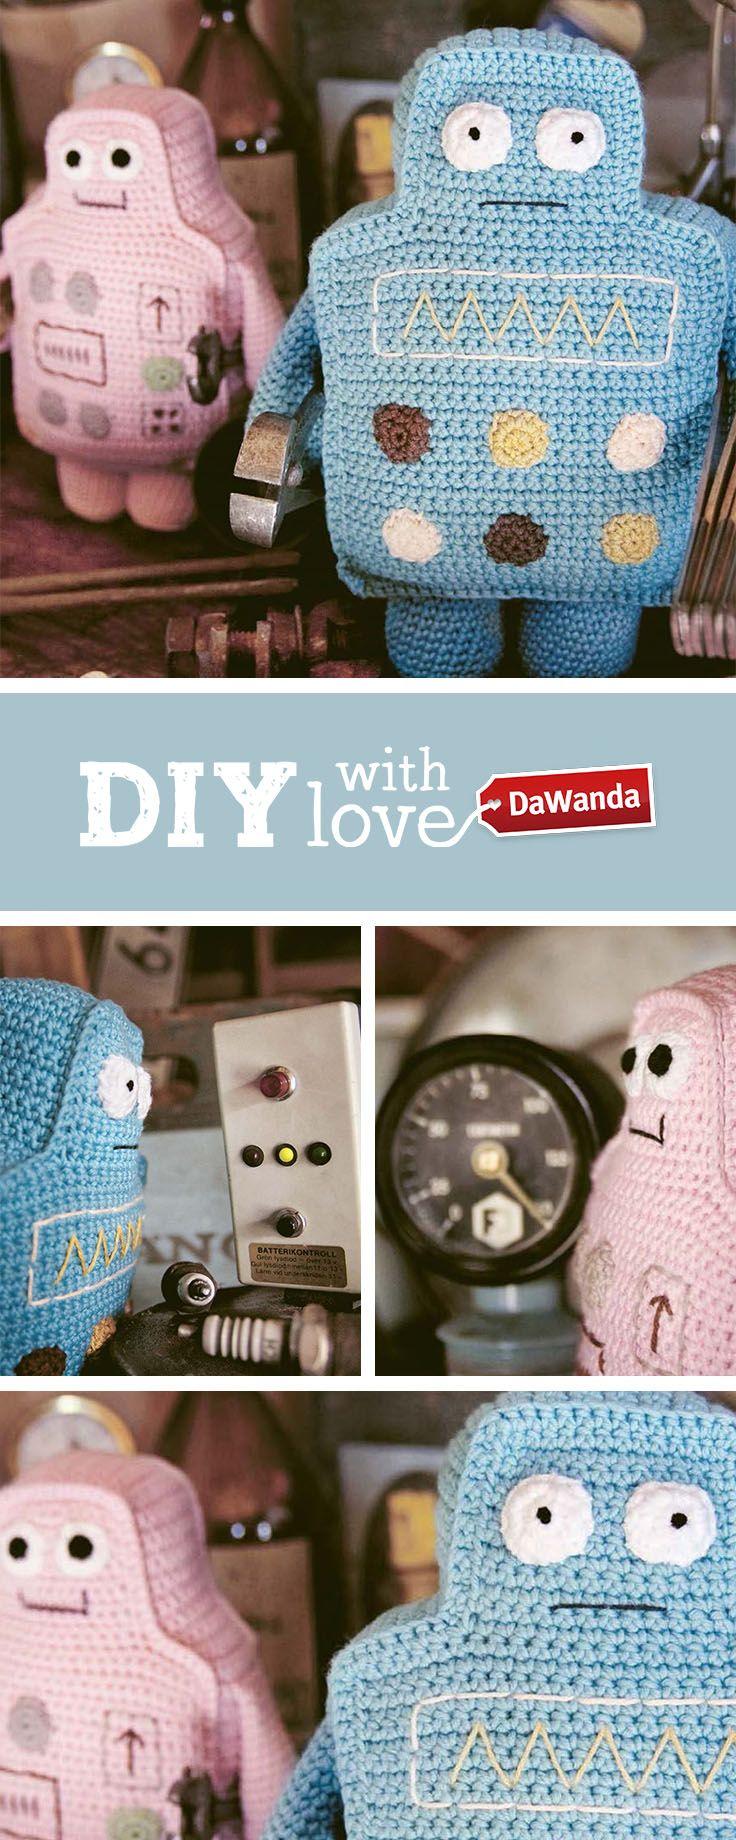 36 besten DIY Amigurumi / Crochet Bilder auf Pinterest | Diy häkeln ...